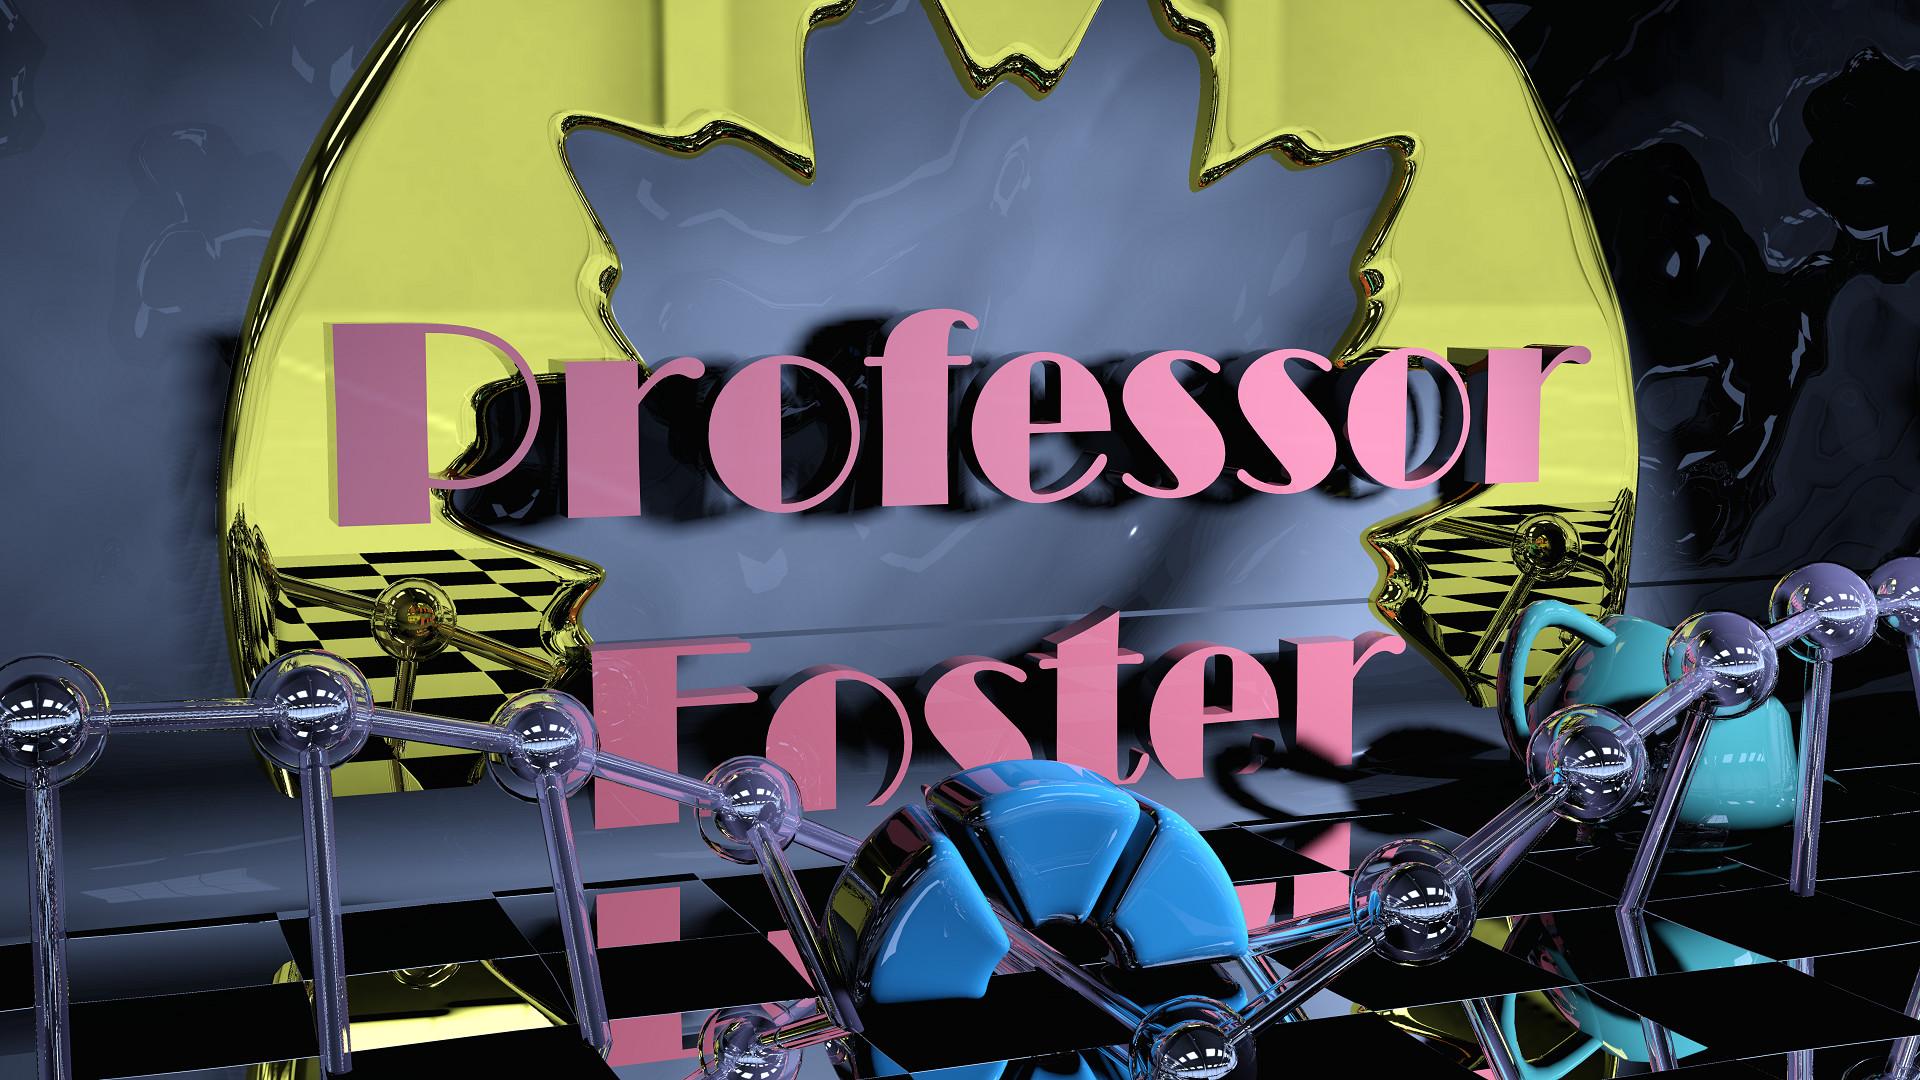 Brian foster professorfoster2k